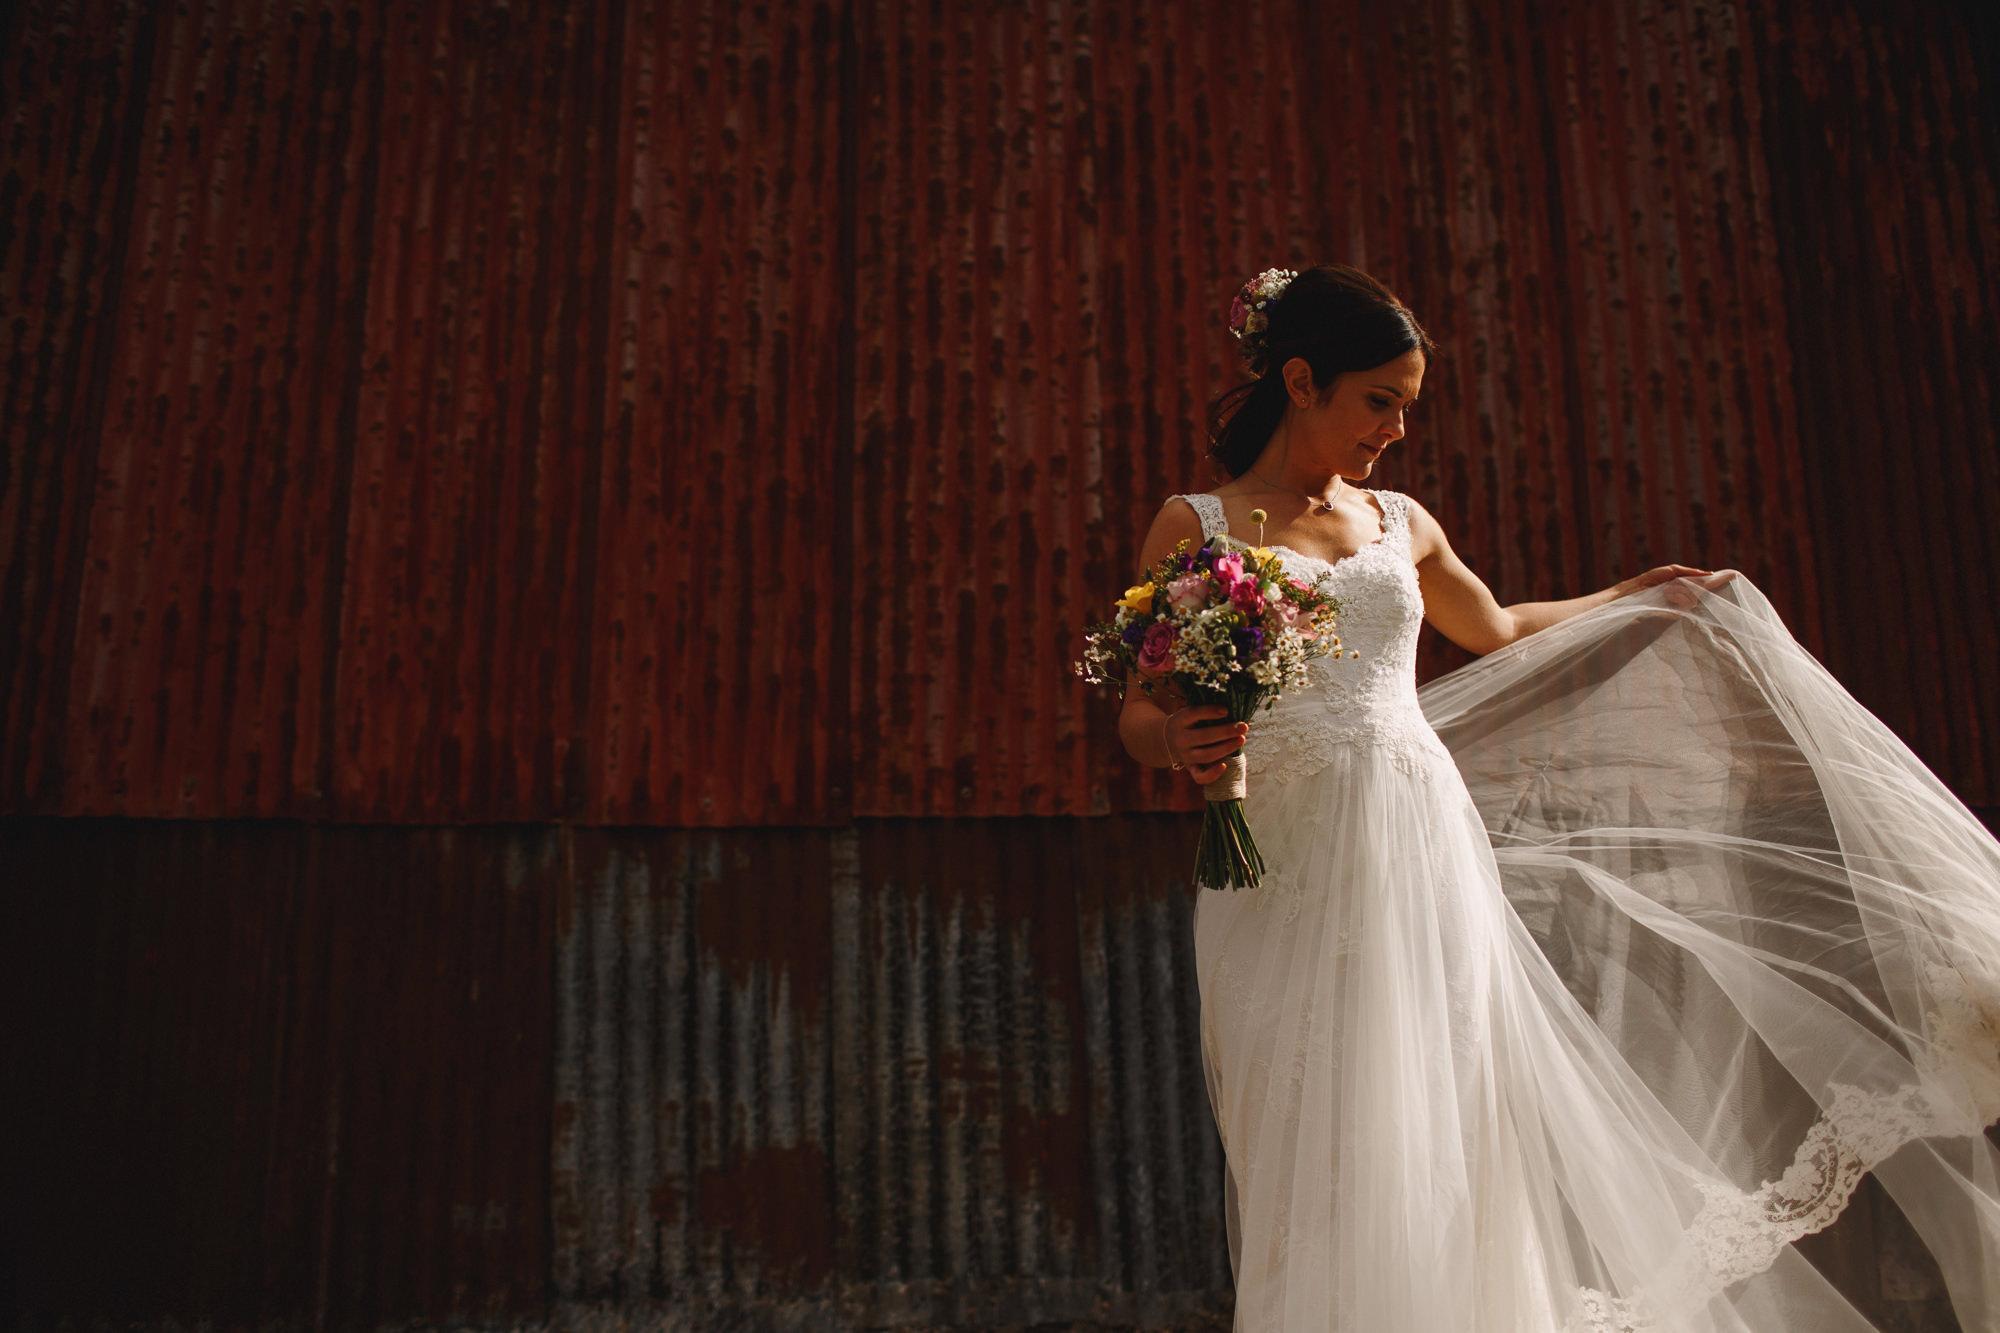 Walcot hall wedding photography shropshire 23